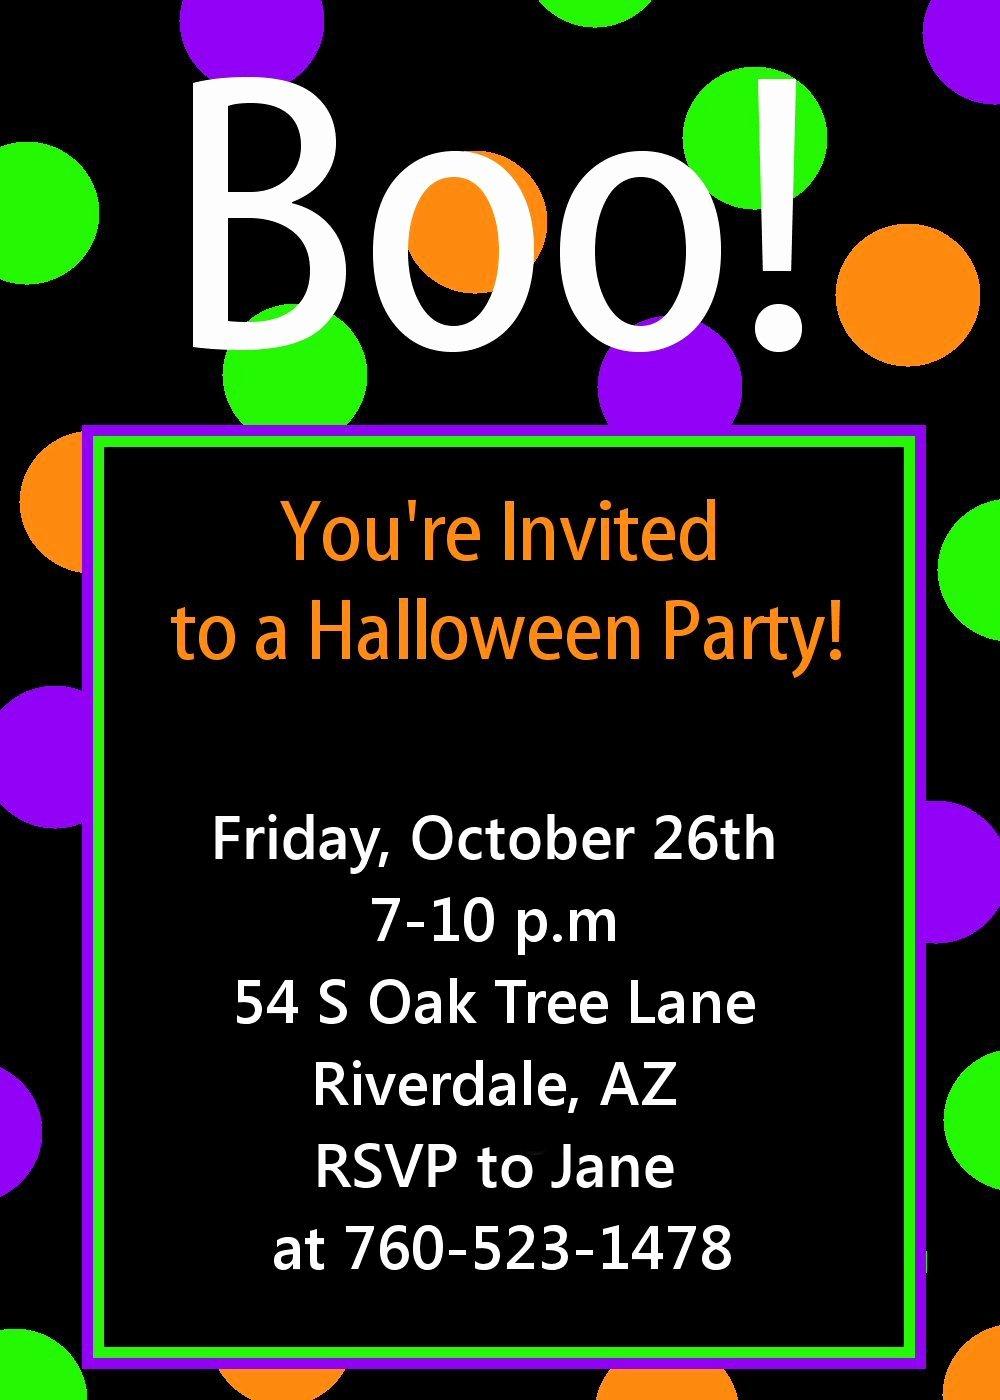 Free Printable Halloween Party Invitations Templates